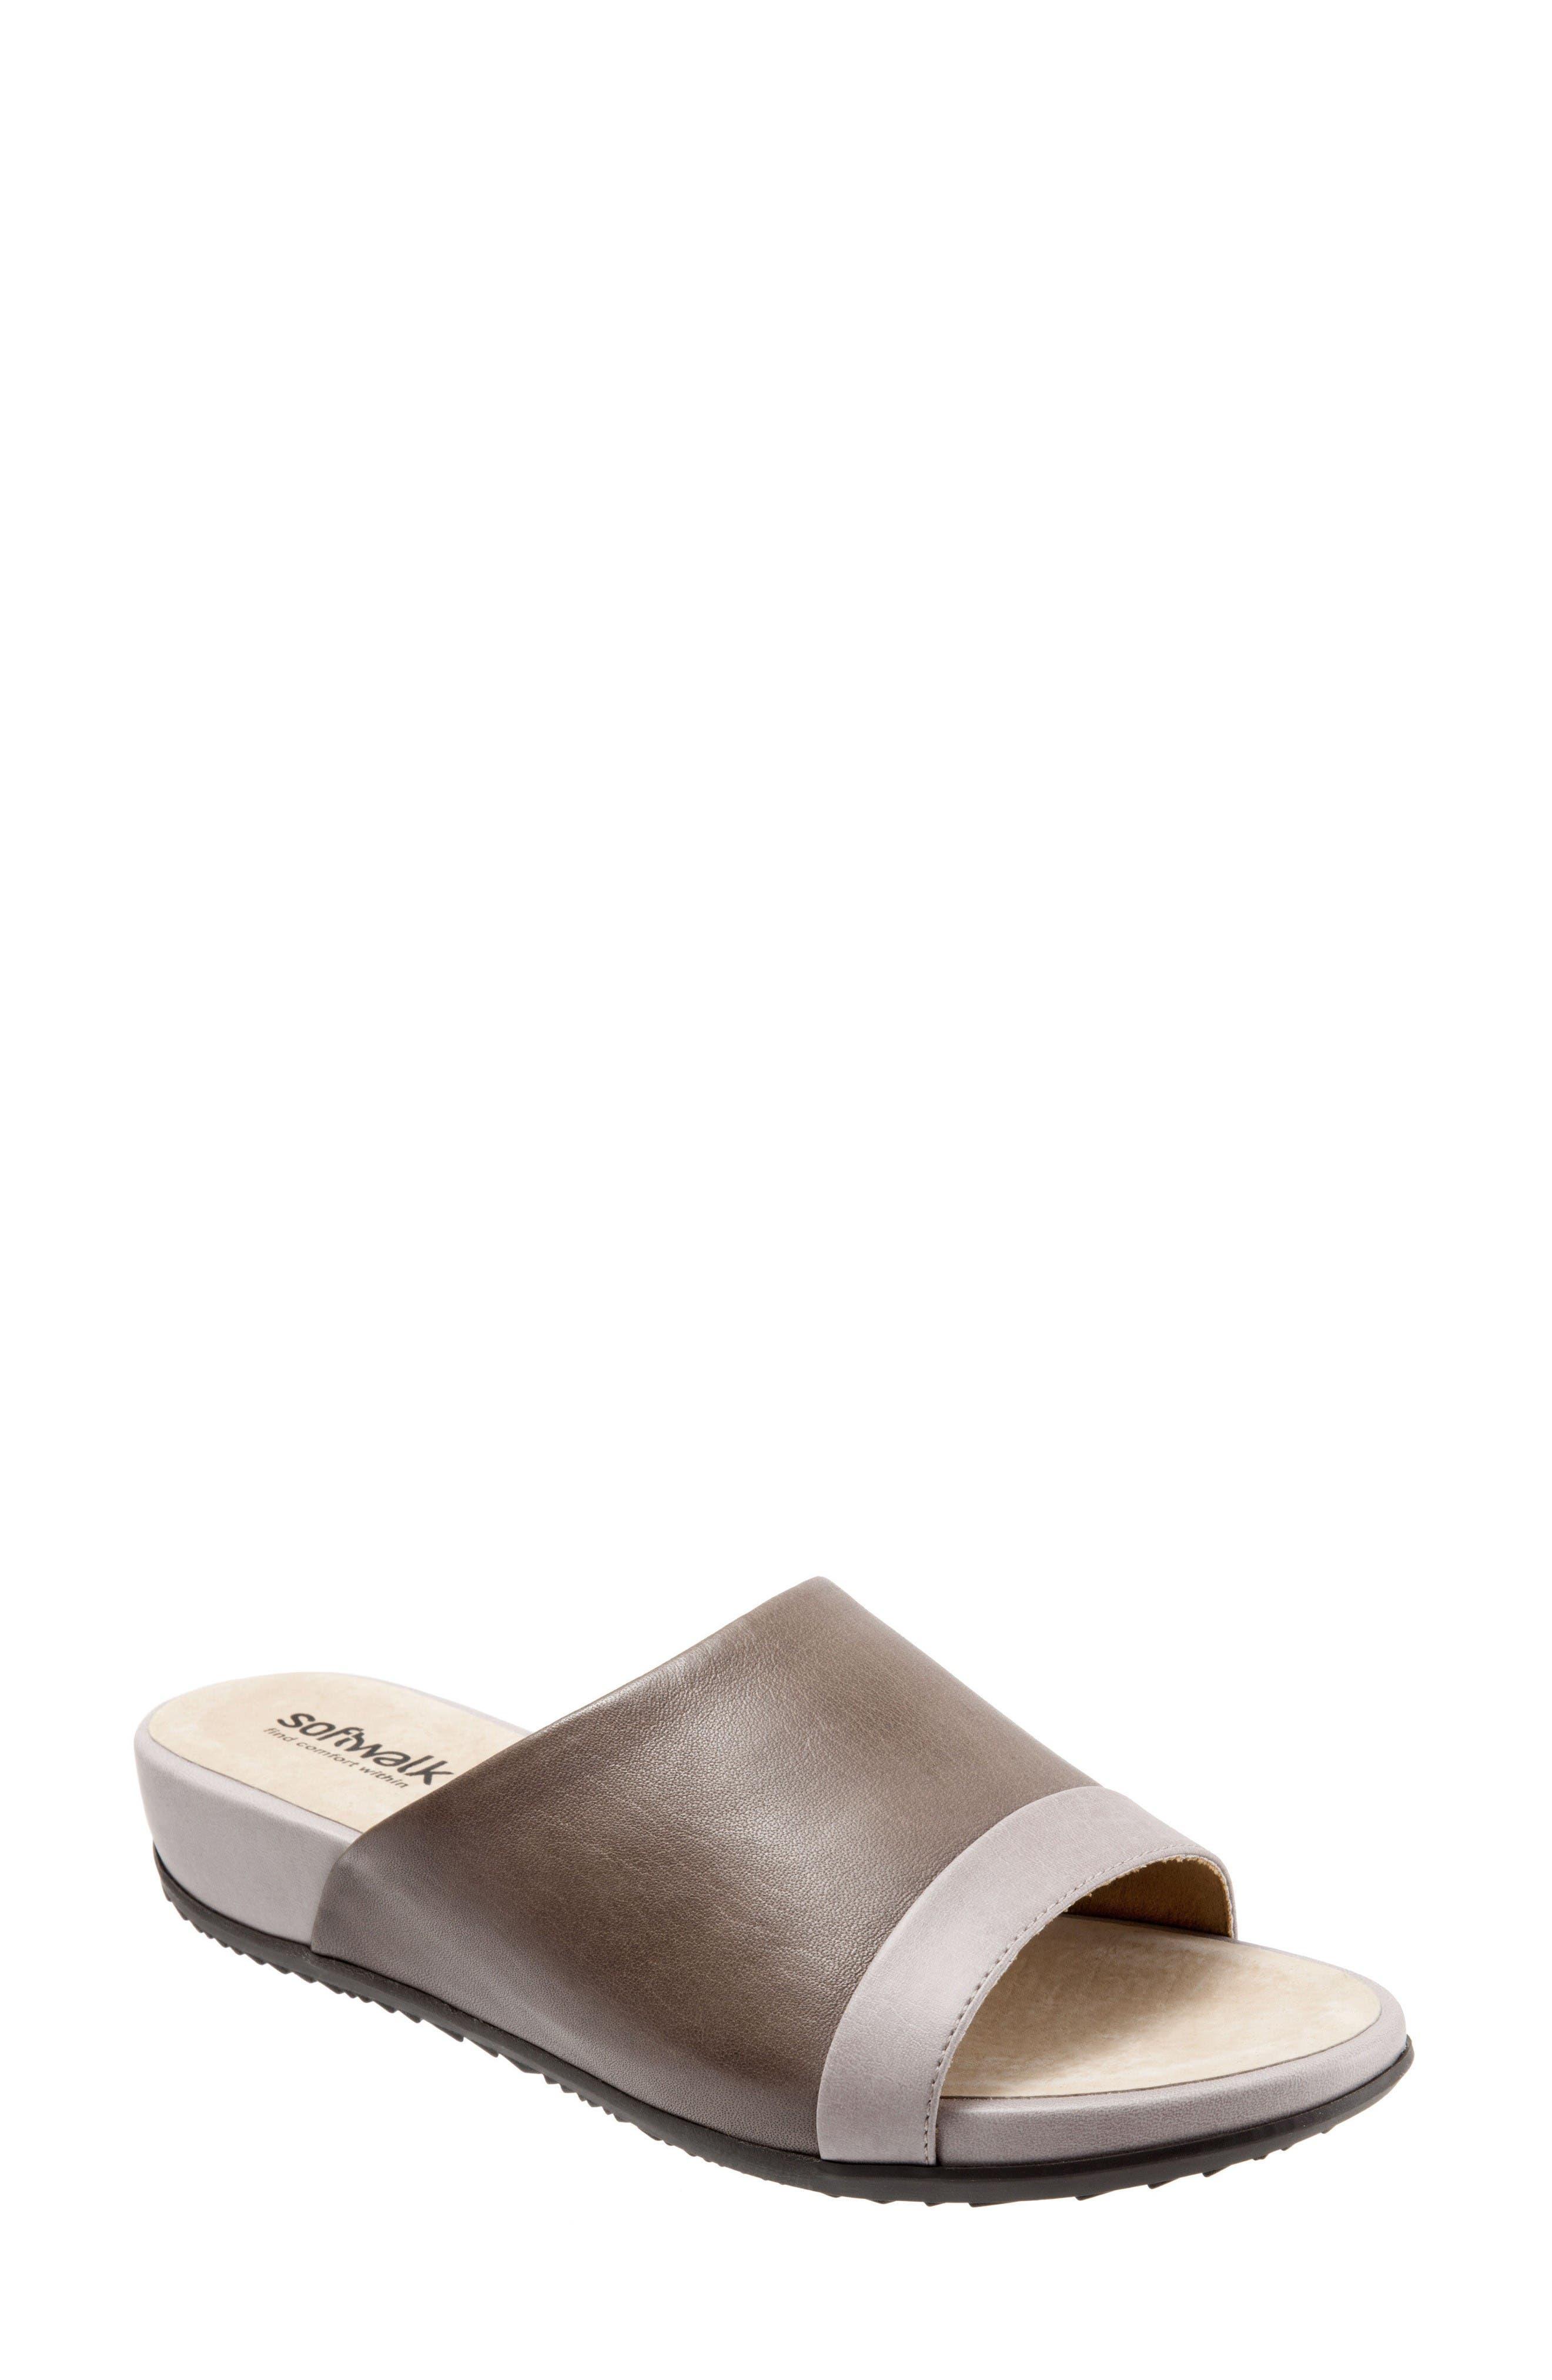 Del Mar Slide Sandal,                             Main thumbnail 1, color,                             Grey Leather